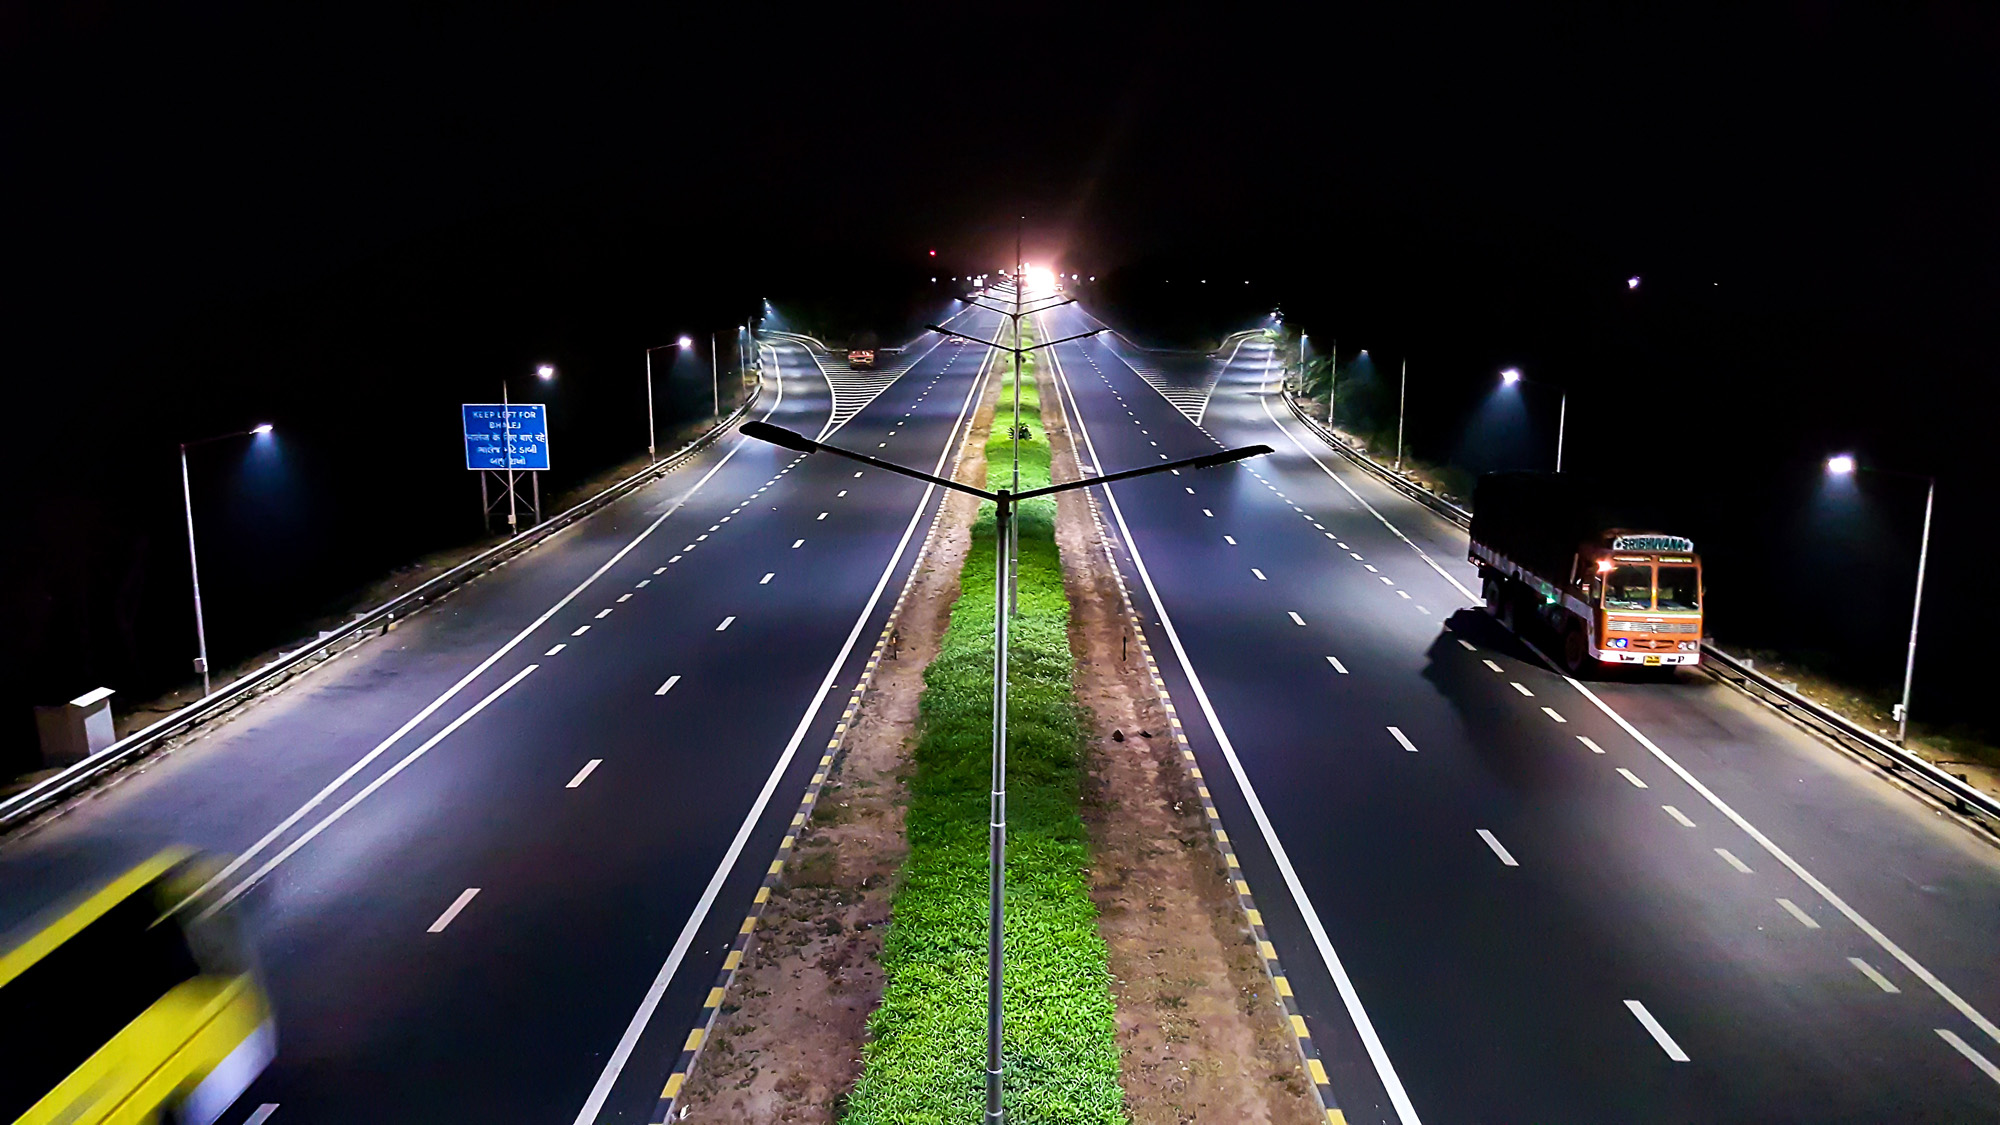 nighttime empty highway